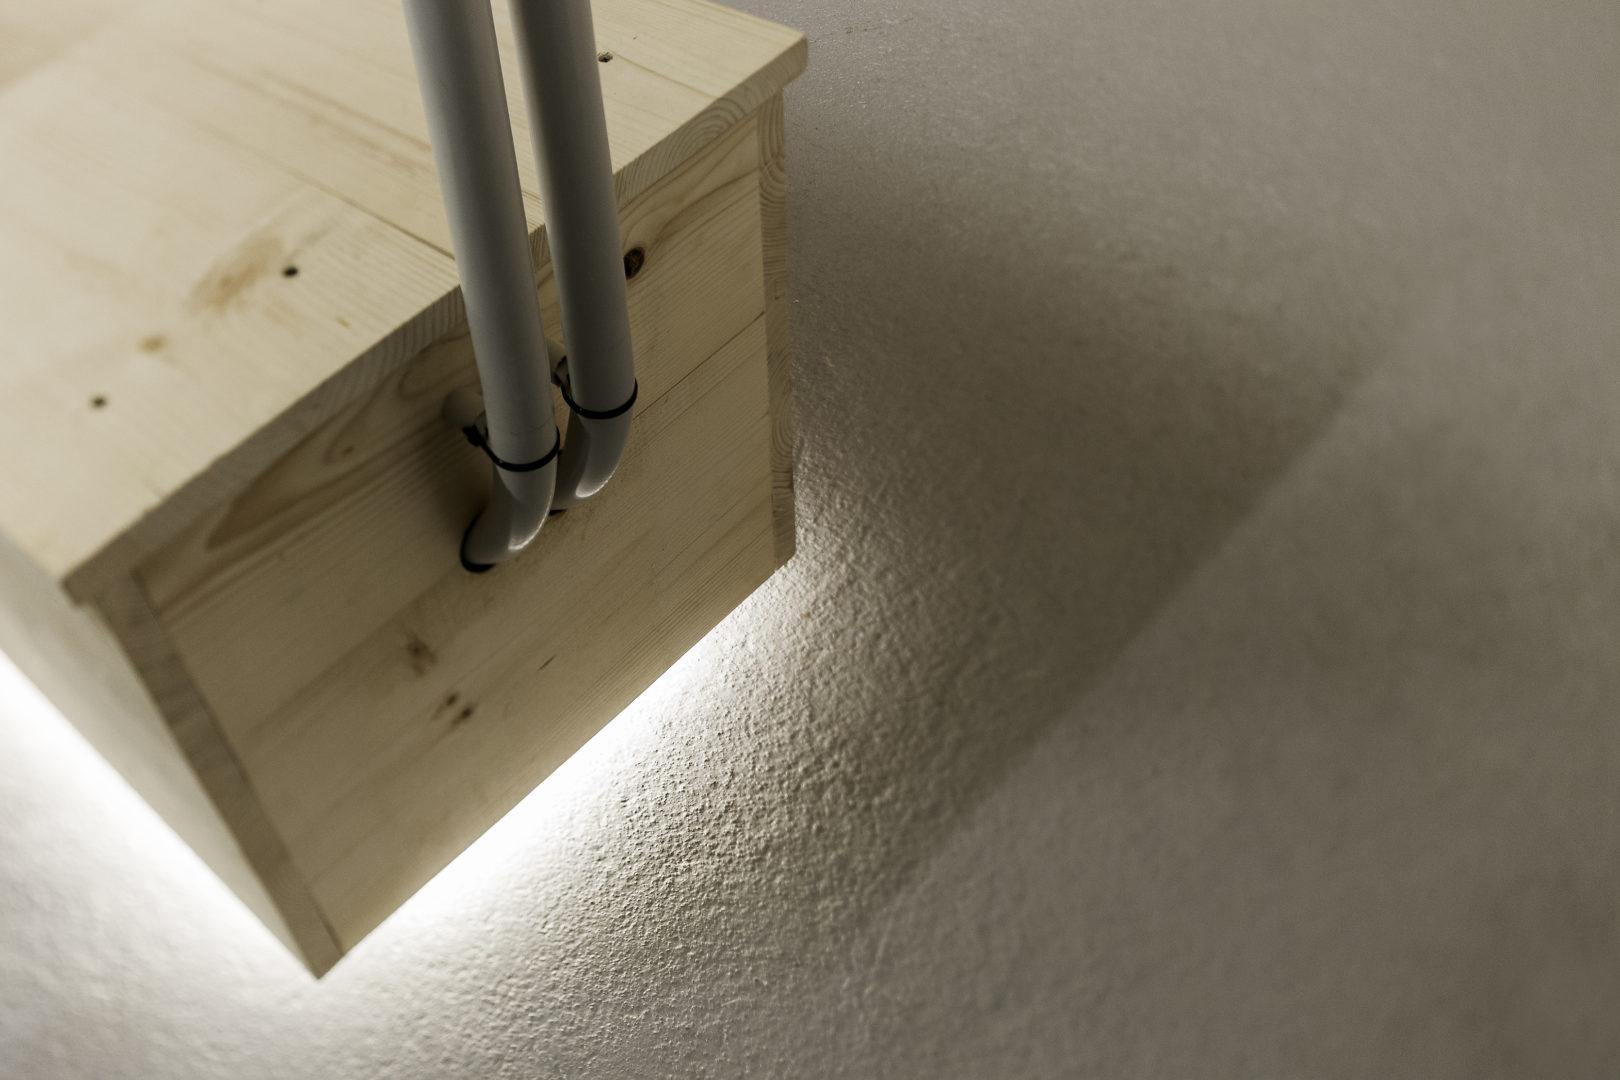 Nanarquitectos Nancontract Interiorismo Diseño Reformas Pontevedra Iconweb